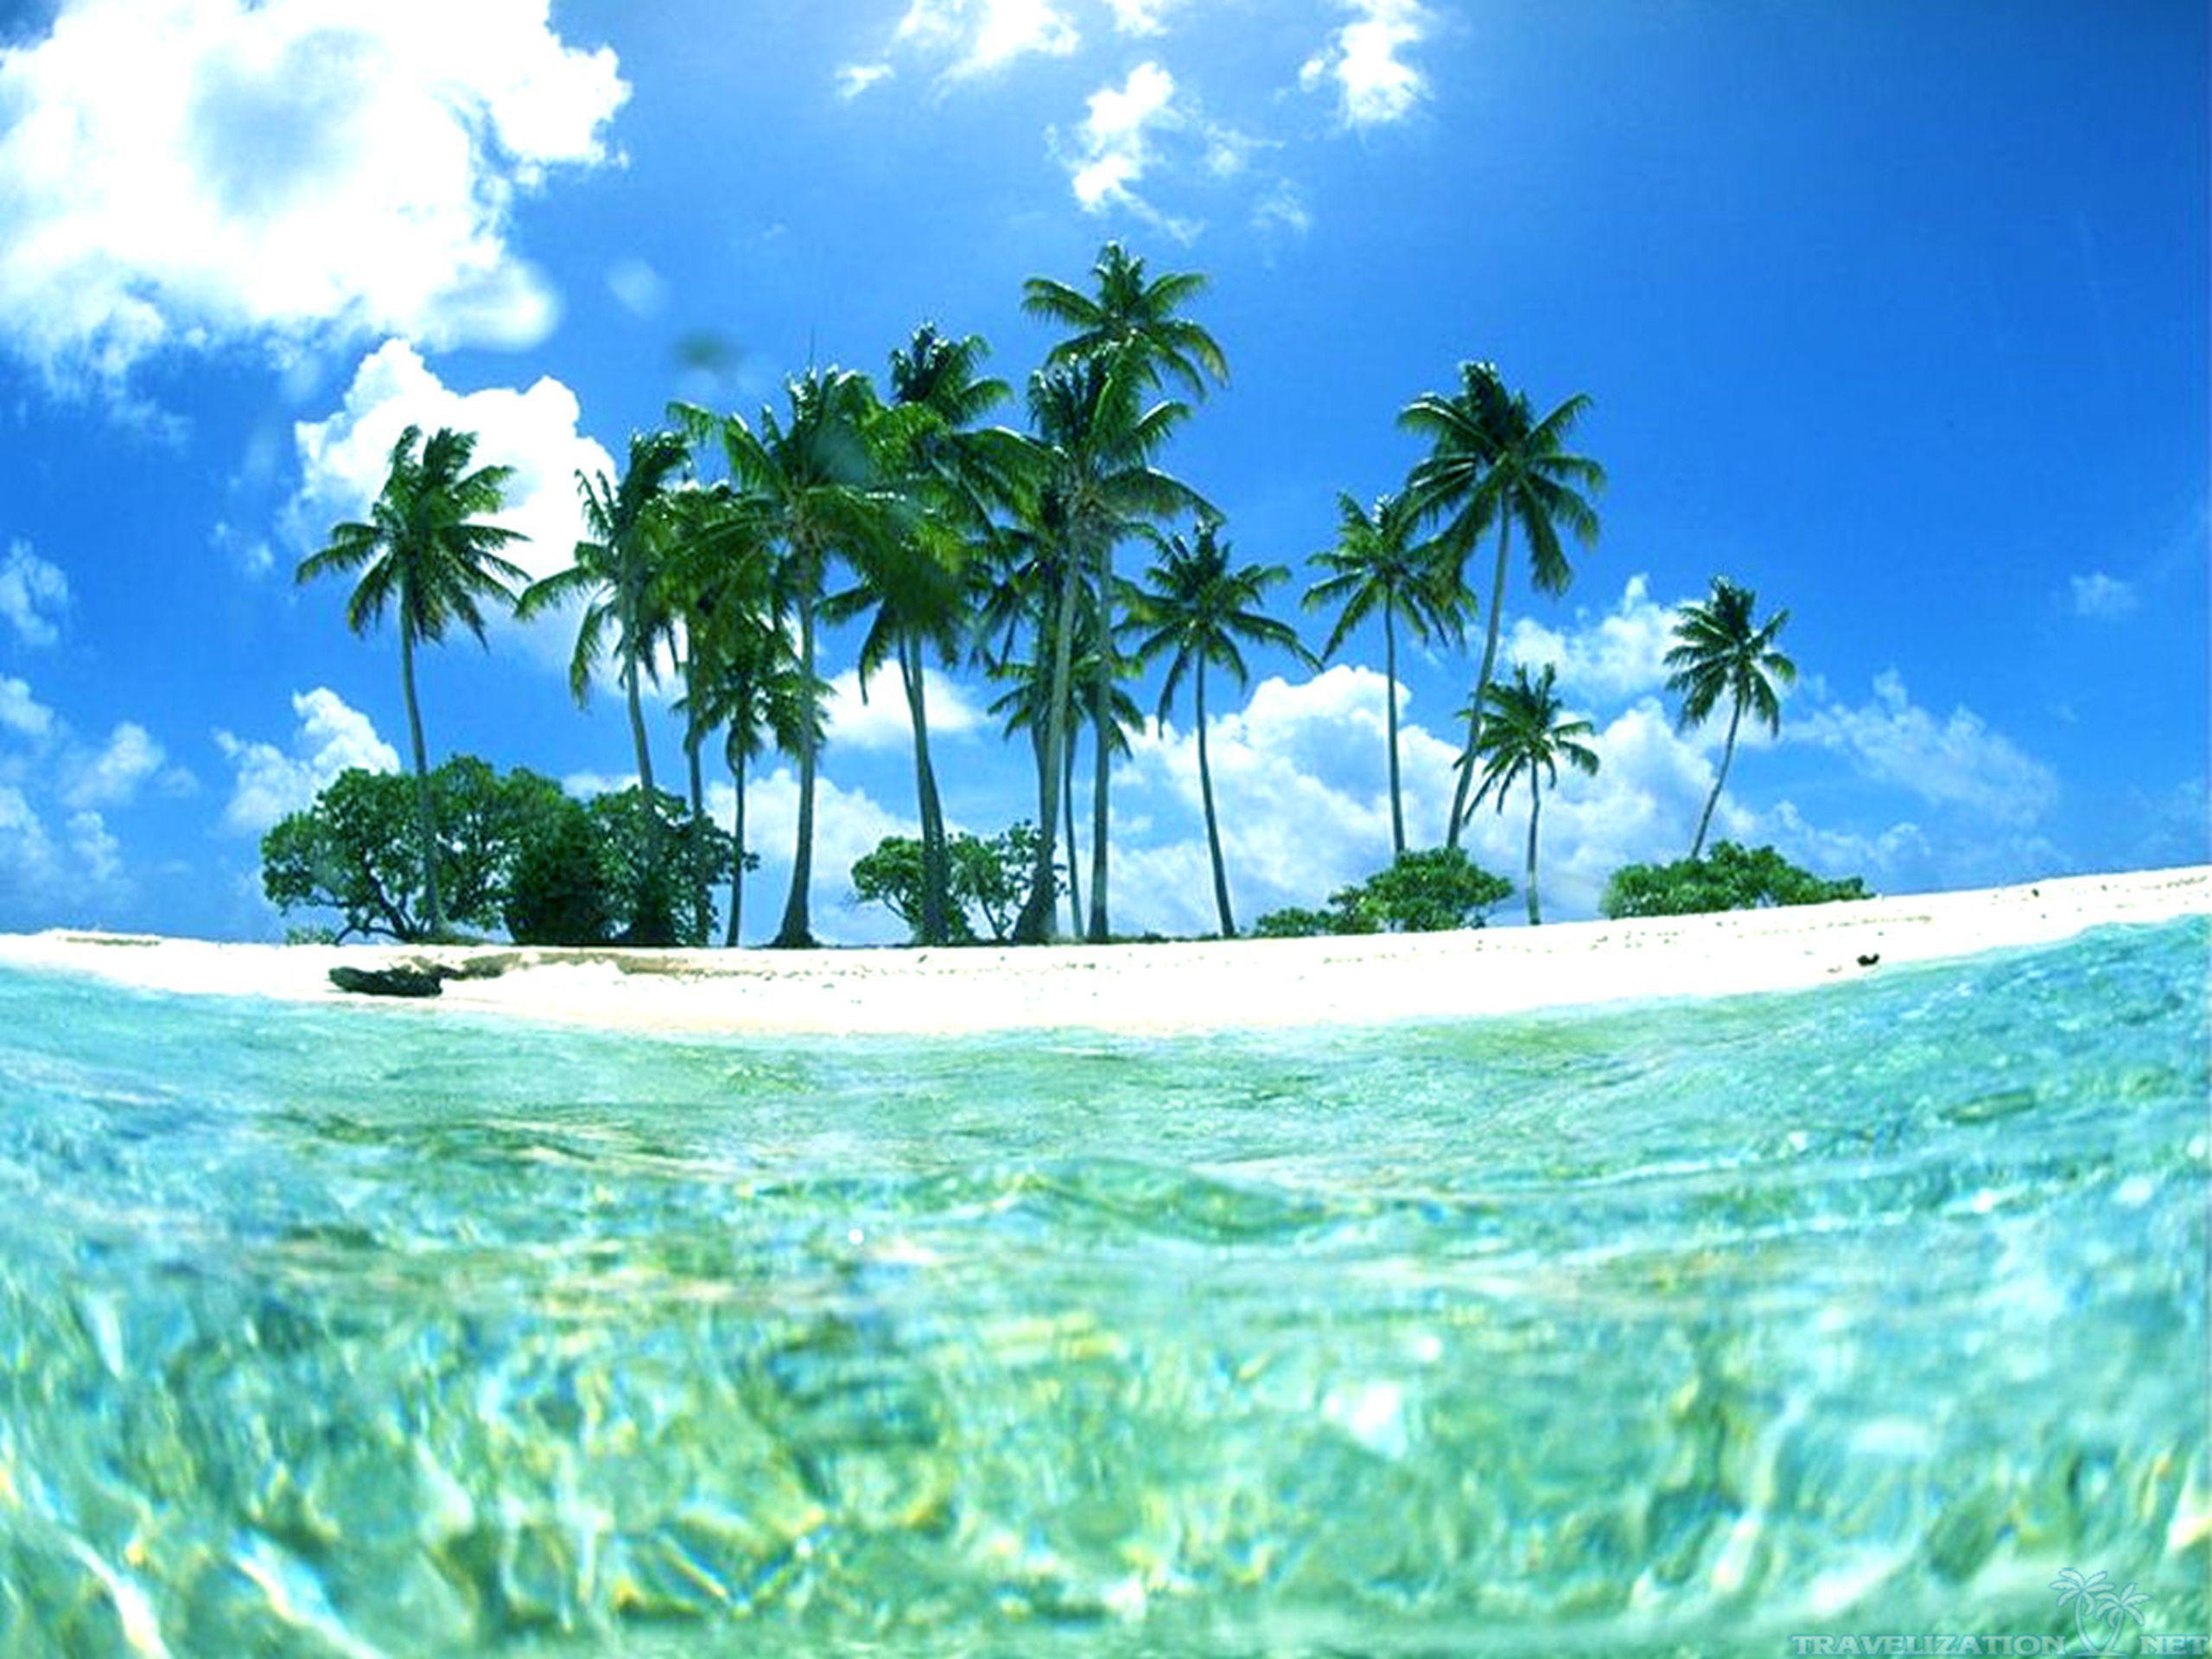 Photo Collection Hd Tropical Island Beach 2560x1920